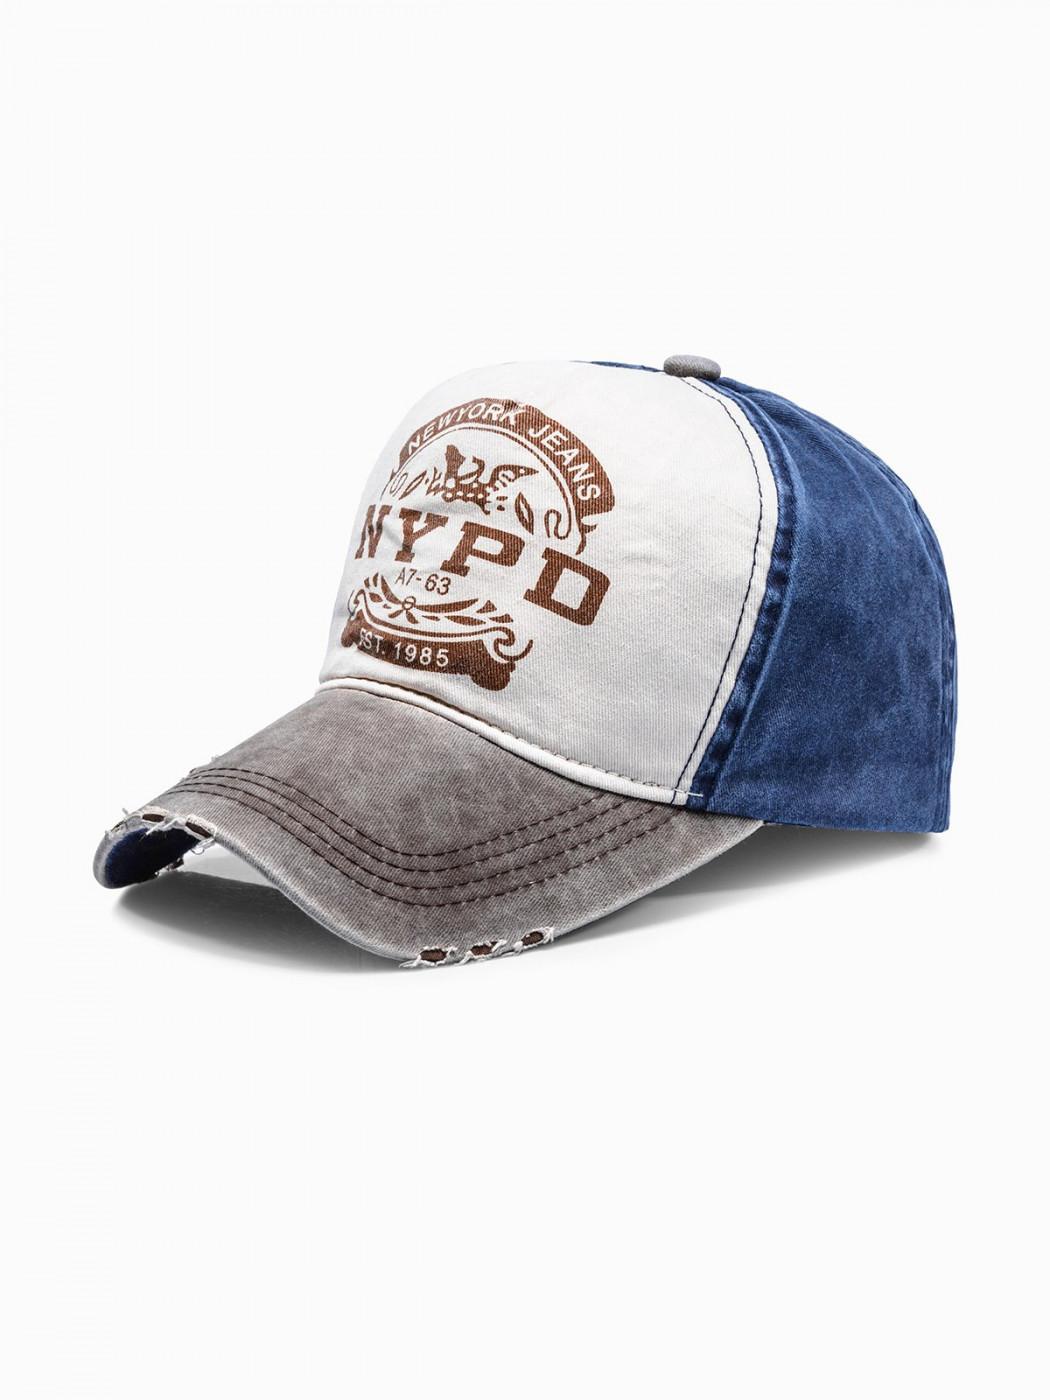 Men's cap H030 - brown